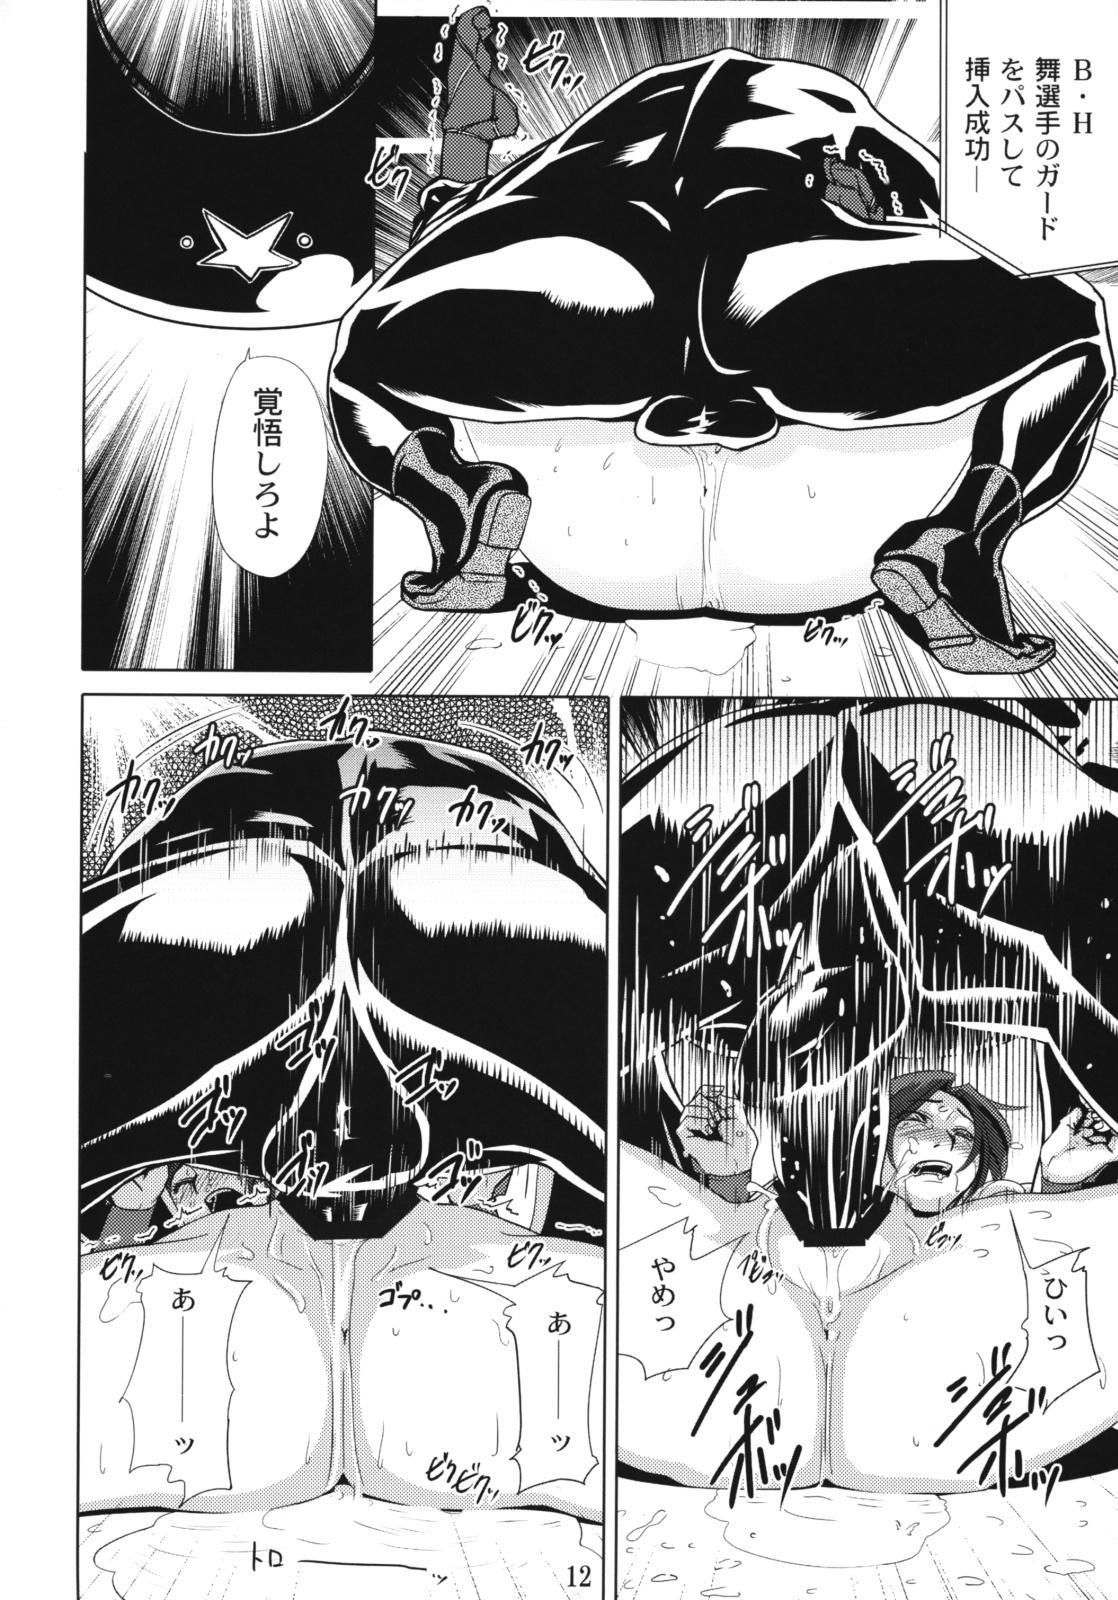 Yojigen Sappou Combi vs Shiranui Mai Round 2 10